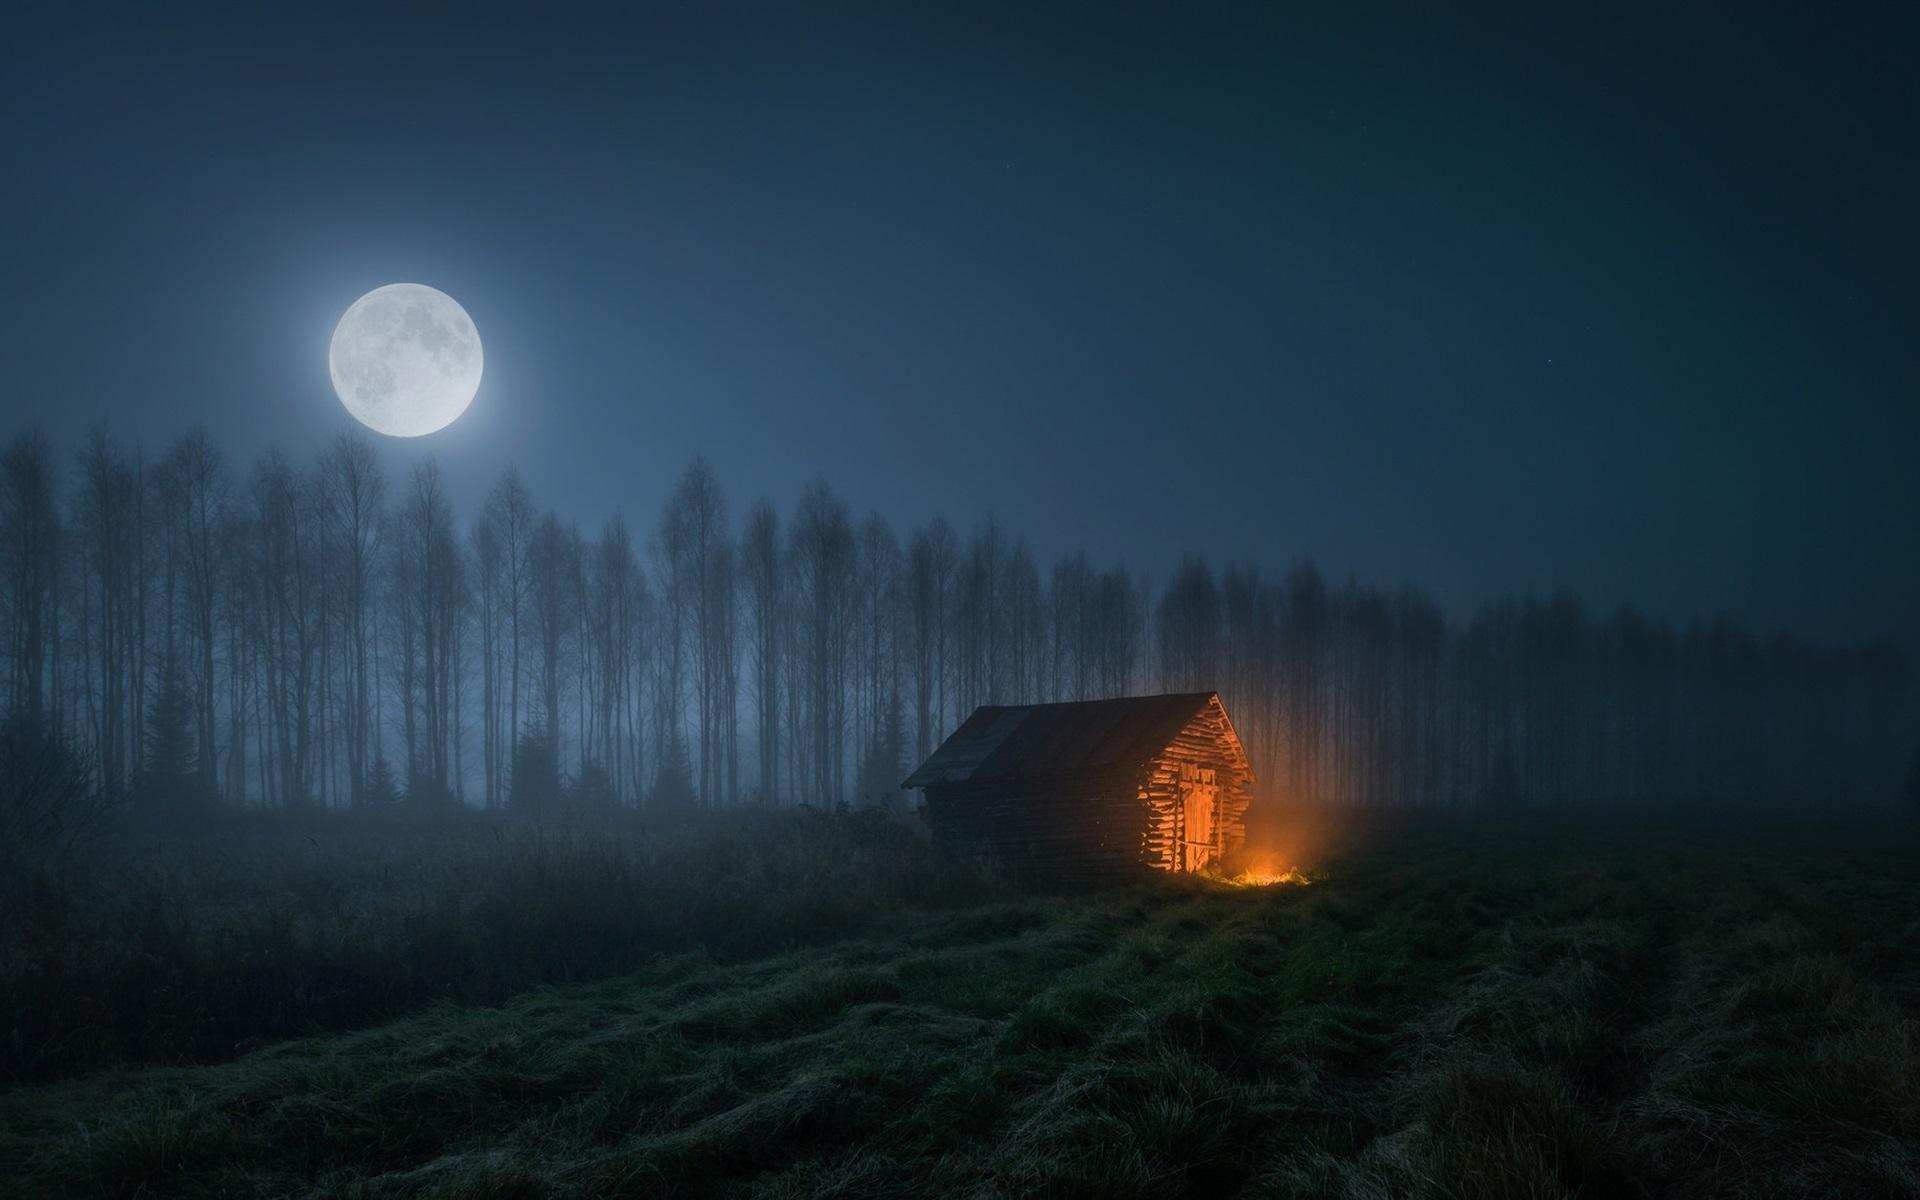 Wallpaper Night Trees Wood House Fire Moon 1920x1200 Hd